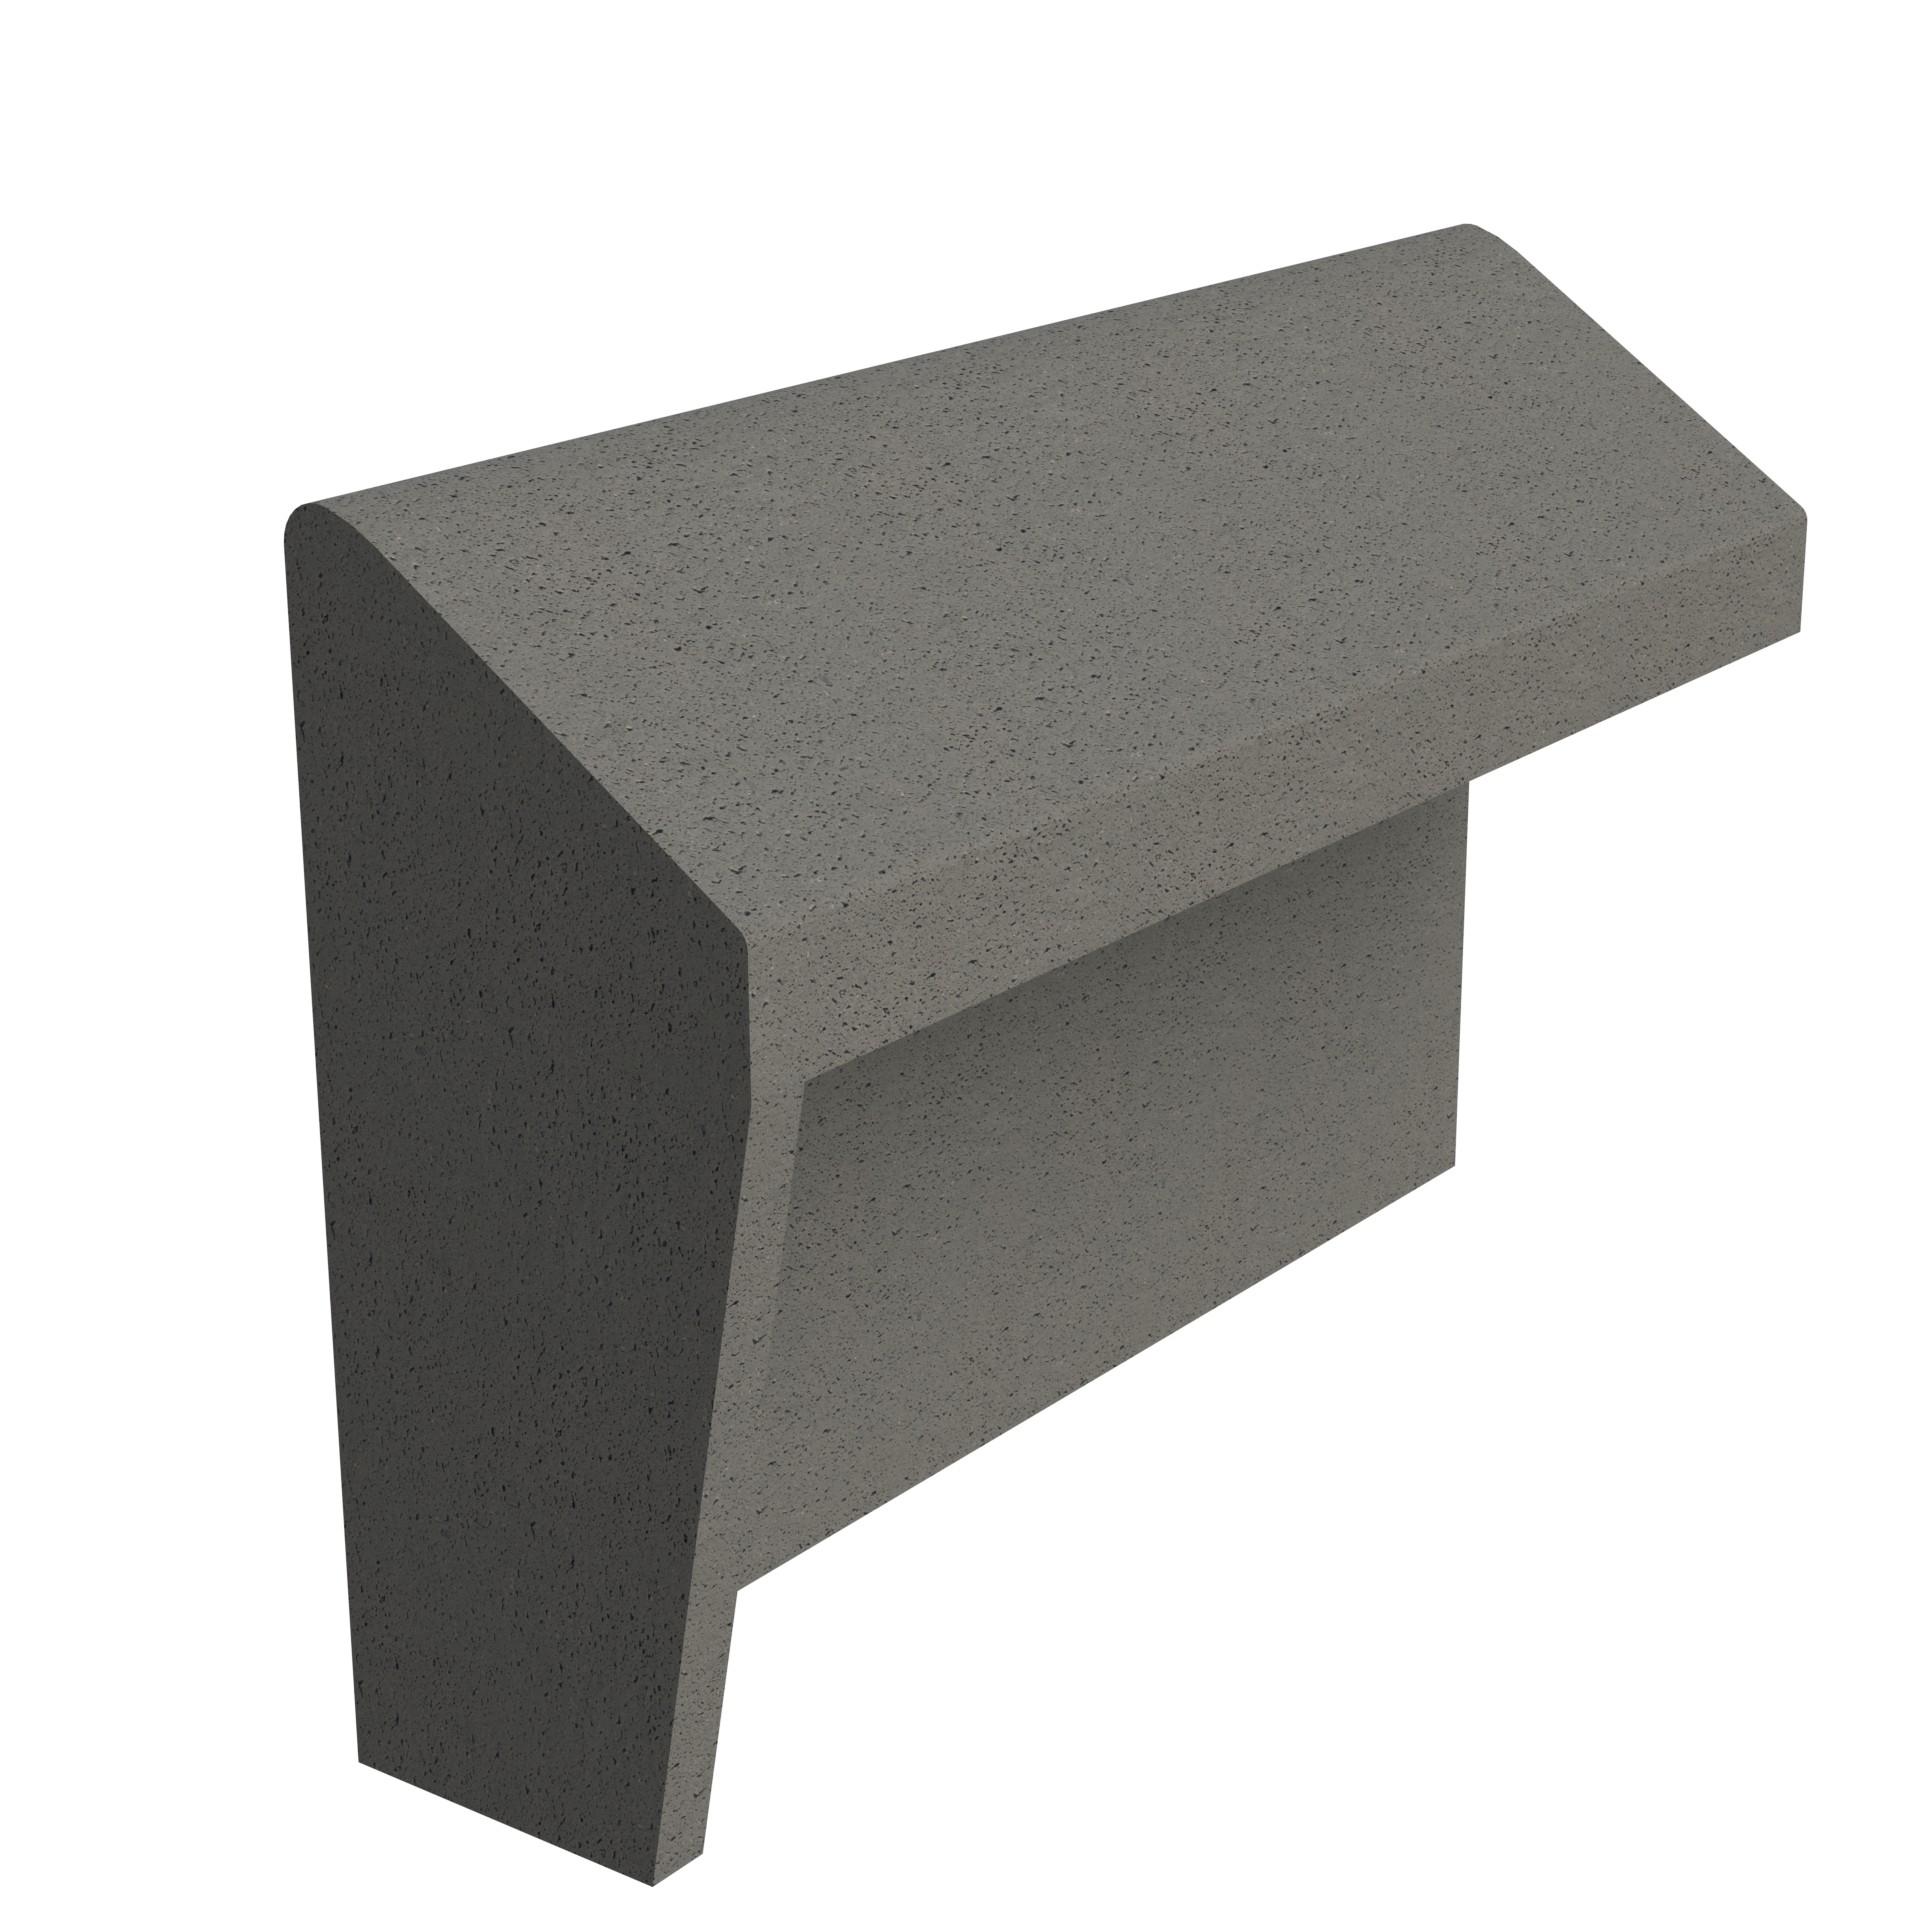 SANDTOFT TILES - Concrete Legged Angle Mono Ridge With Block End LH